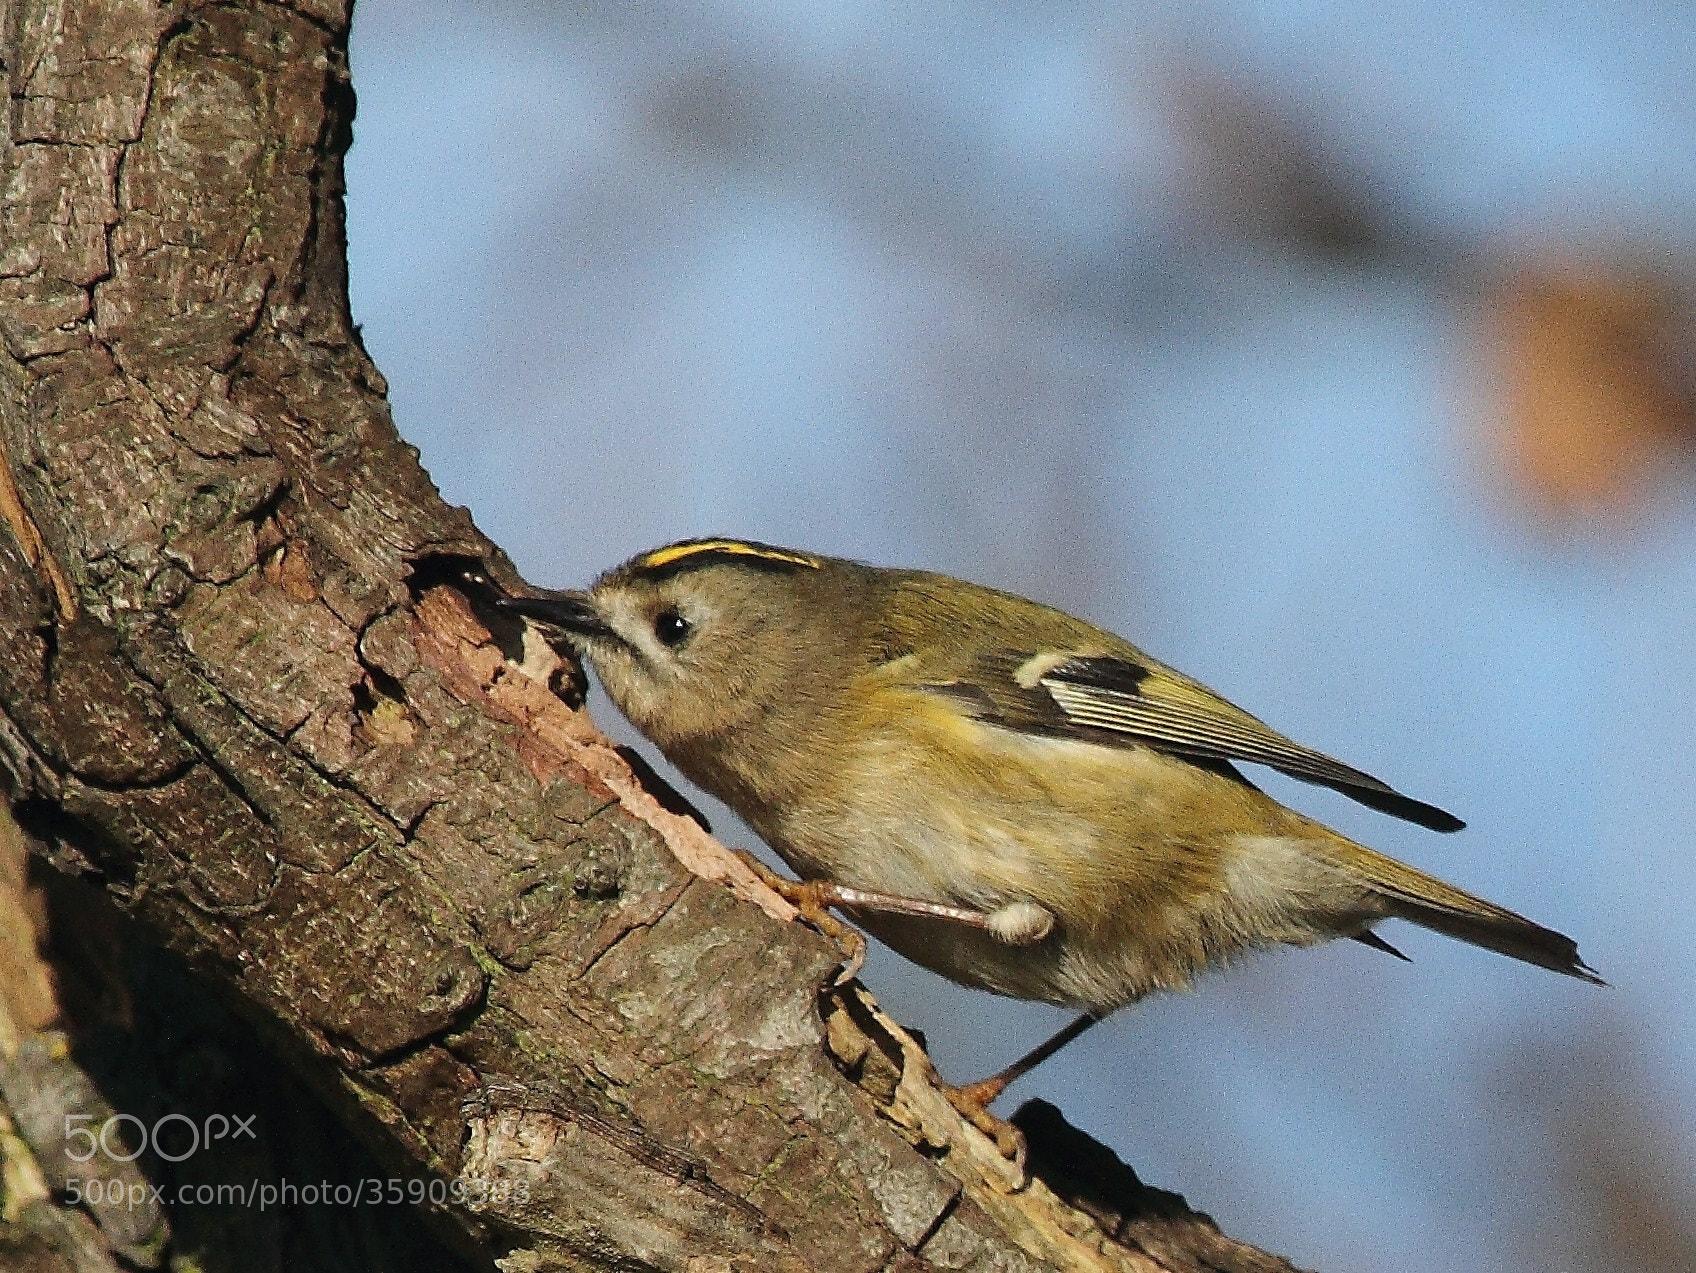 Photograph Goldcrest bird by Steve Adams on 500px